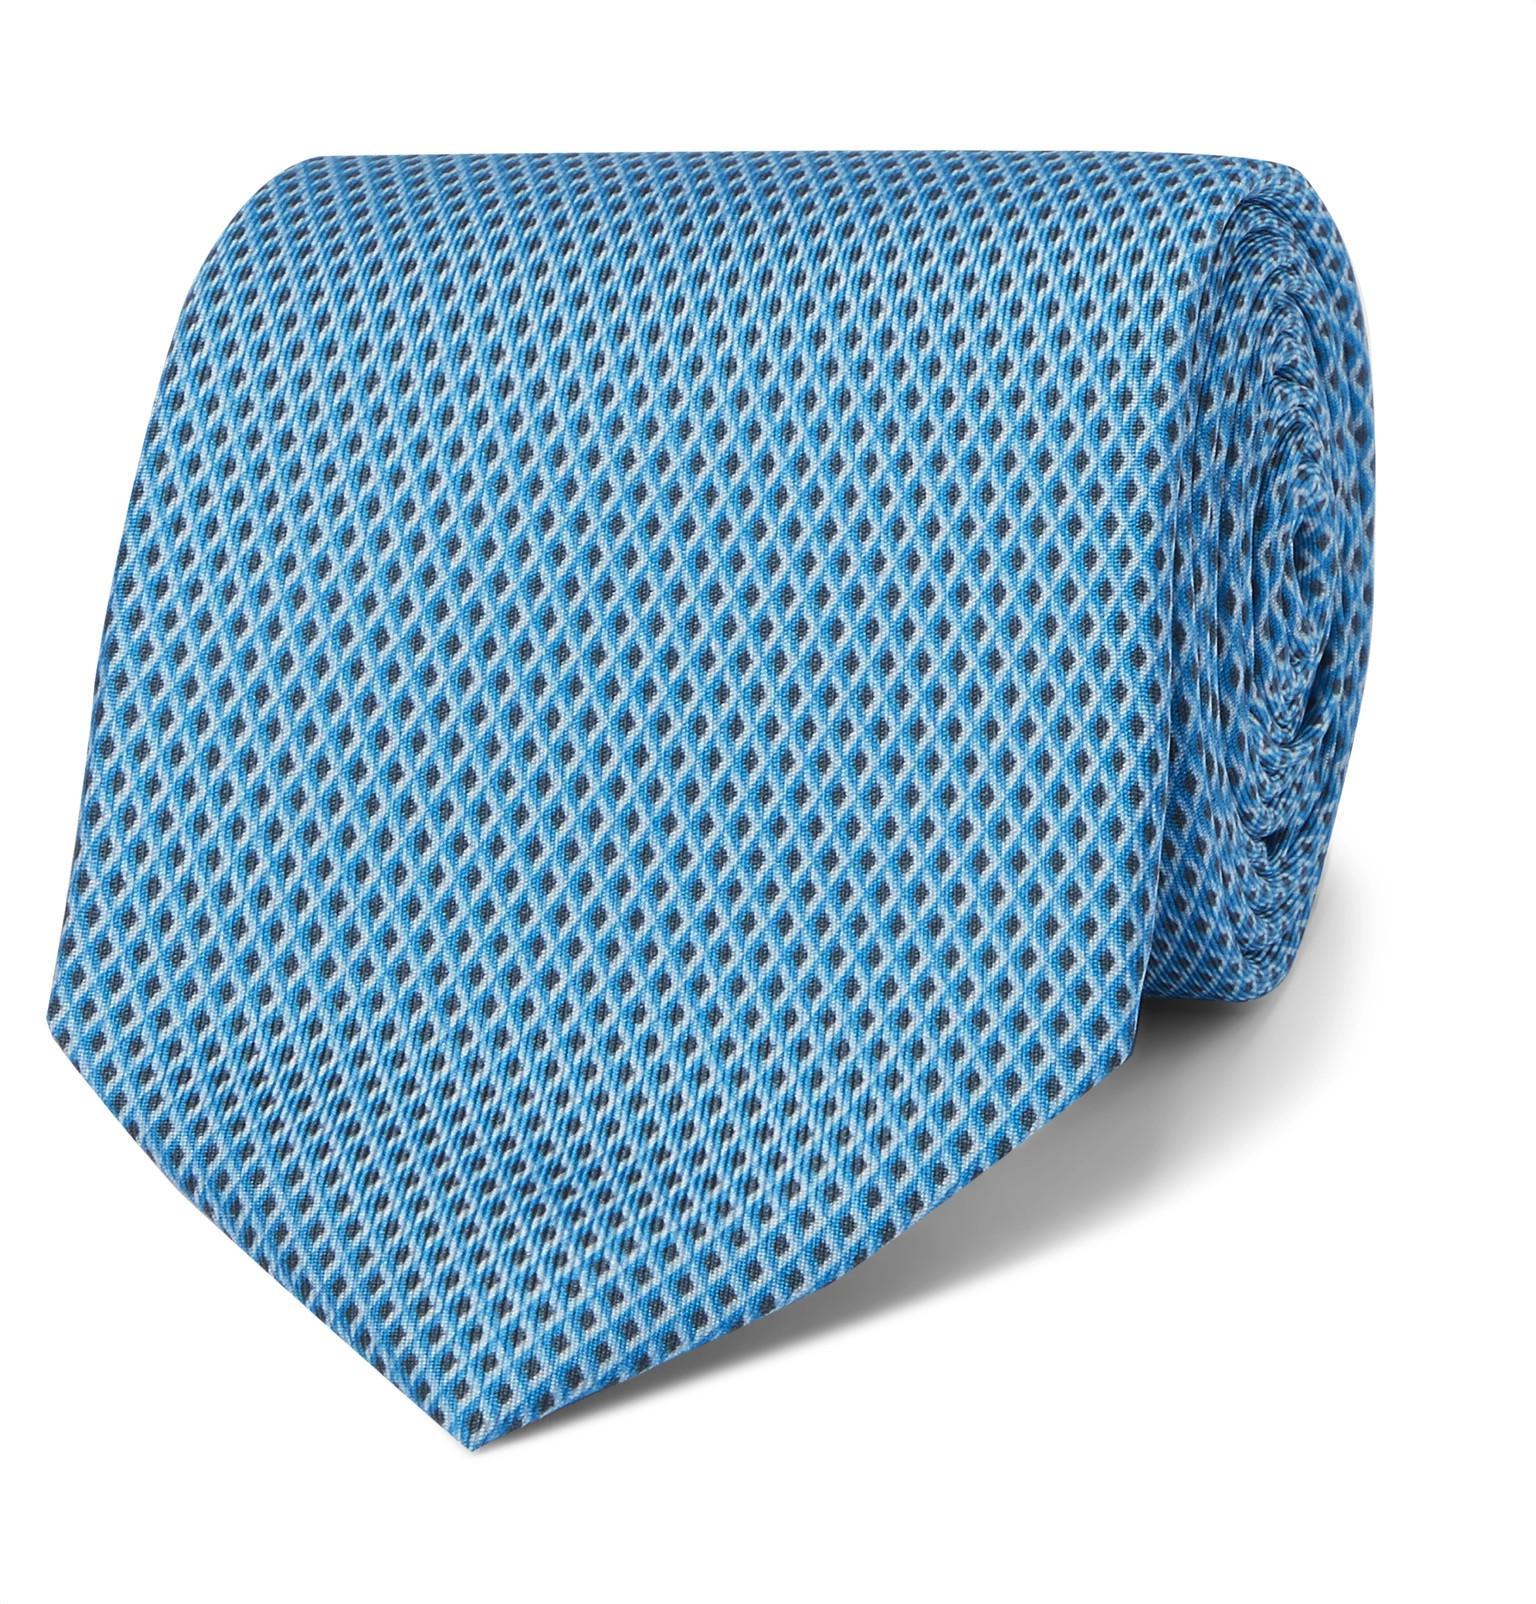 8cm Printed Mulberry Silk-jacquard Tie Dunhill Y1BoLsaoyK